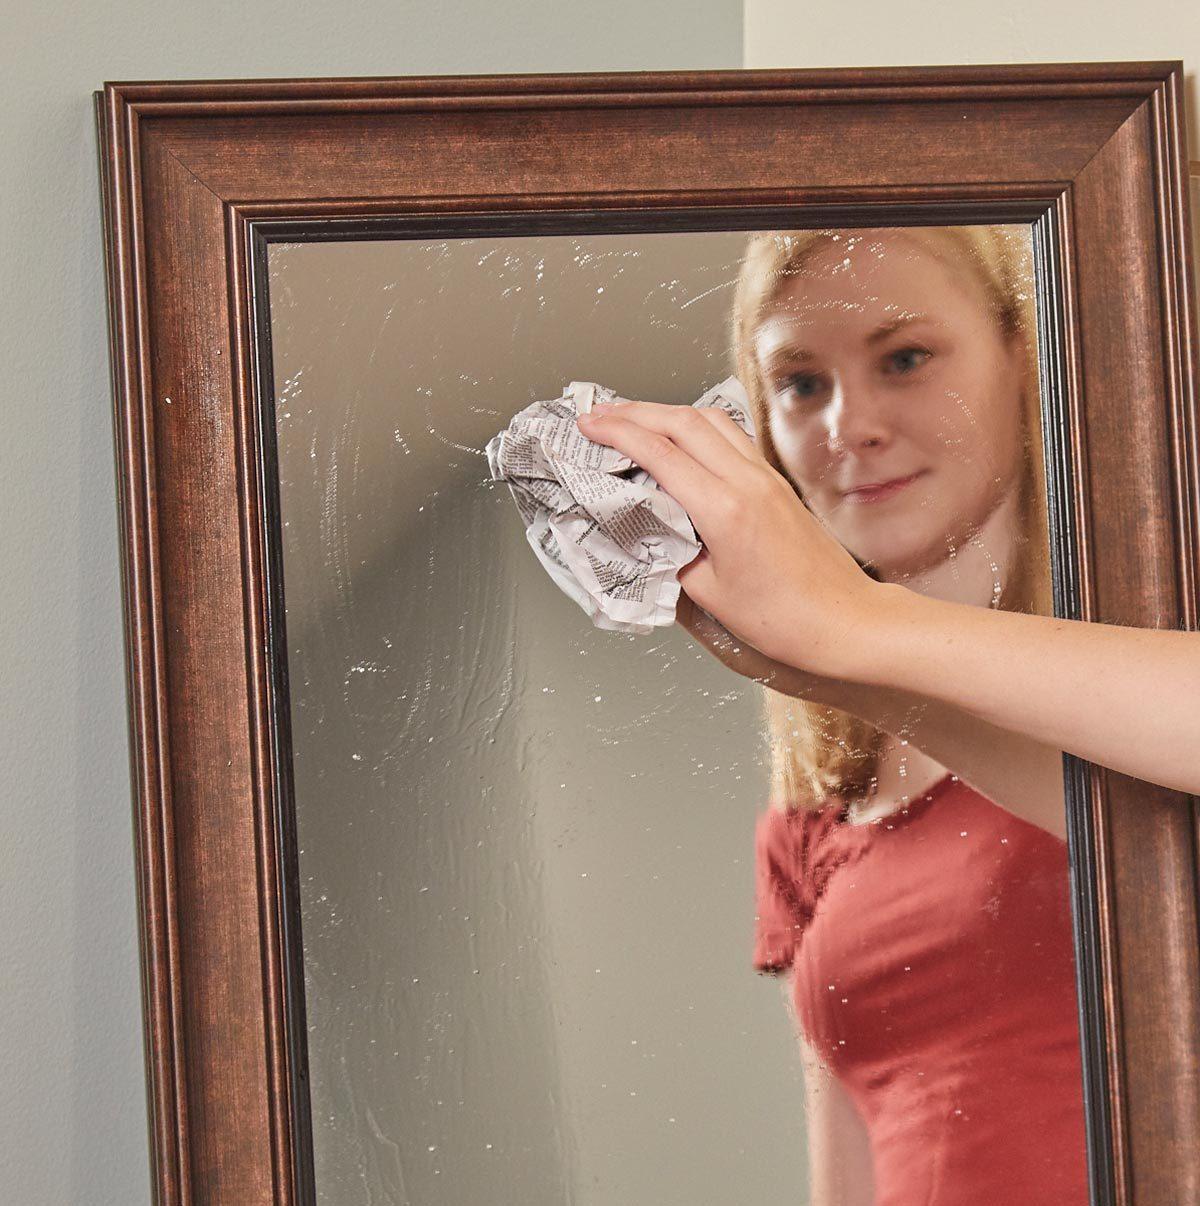 HH newspaper streak free glass